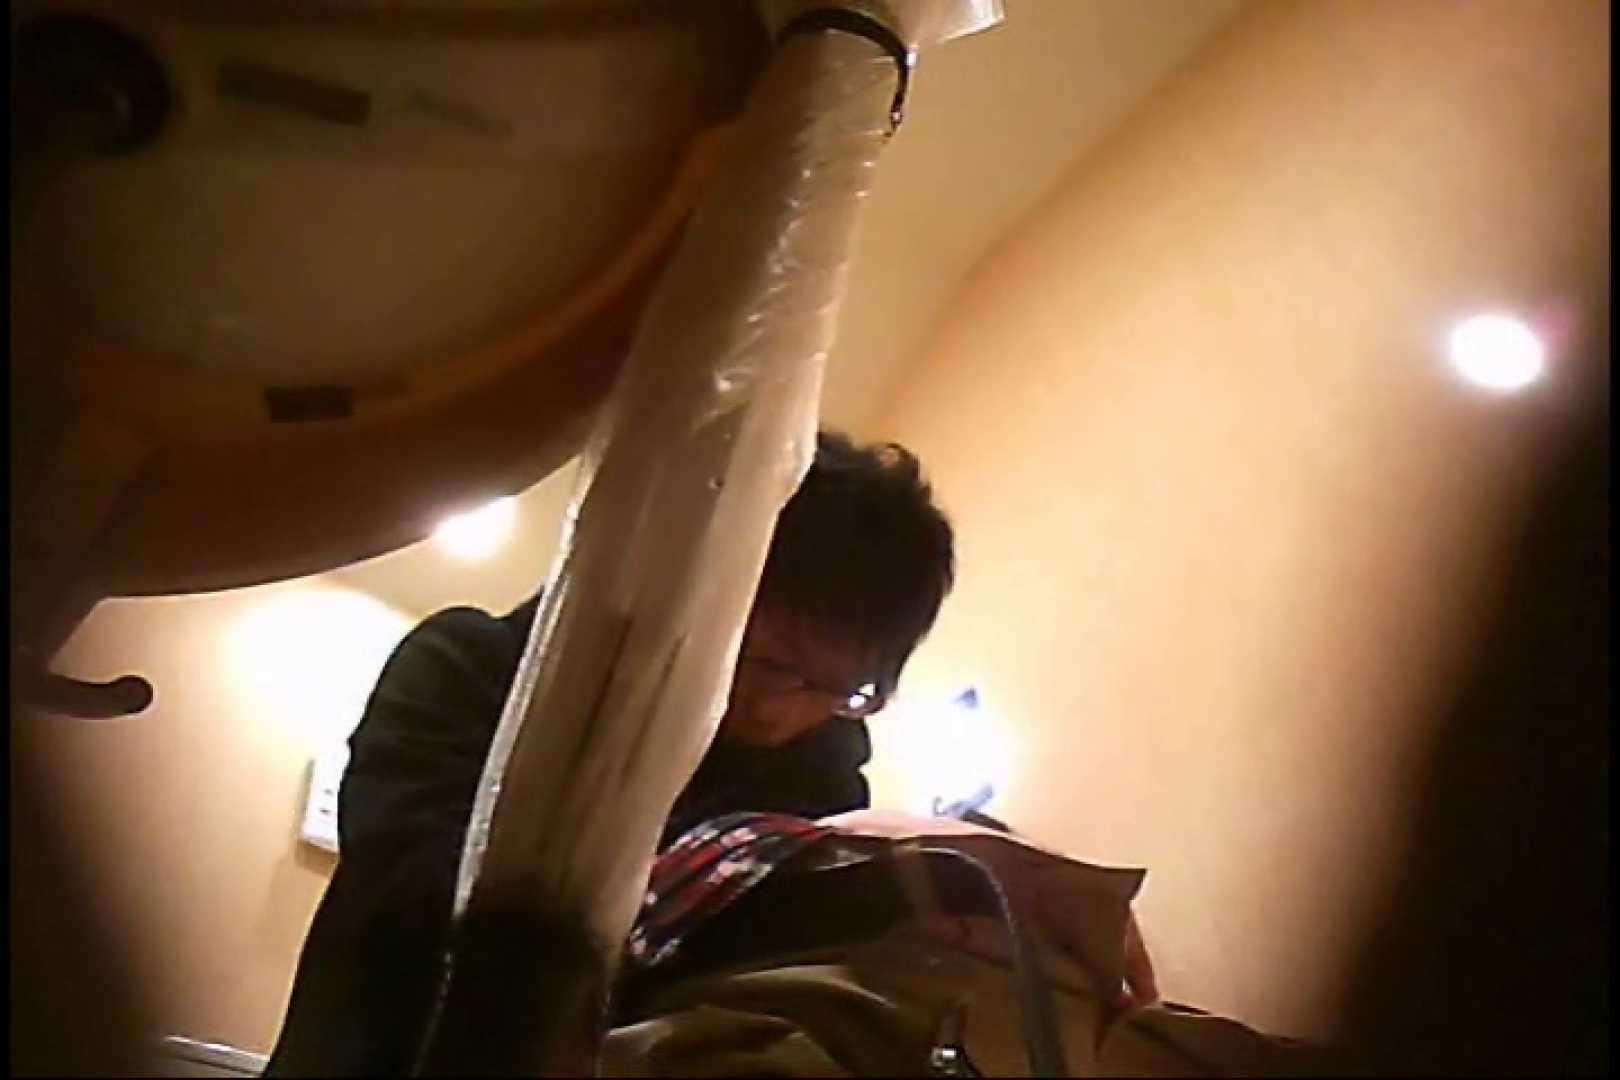 Gボーイ初投稿!掴み取りさんの洗面所覗き!in新幹線!VOL.06 リーマン系男子 ゲイセックス画像 101枚 57